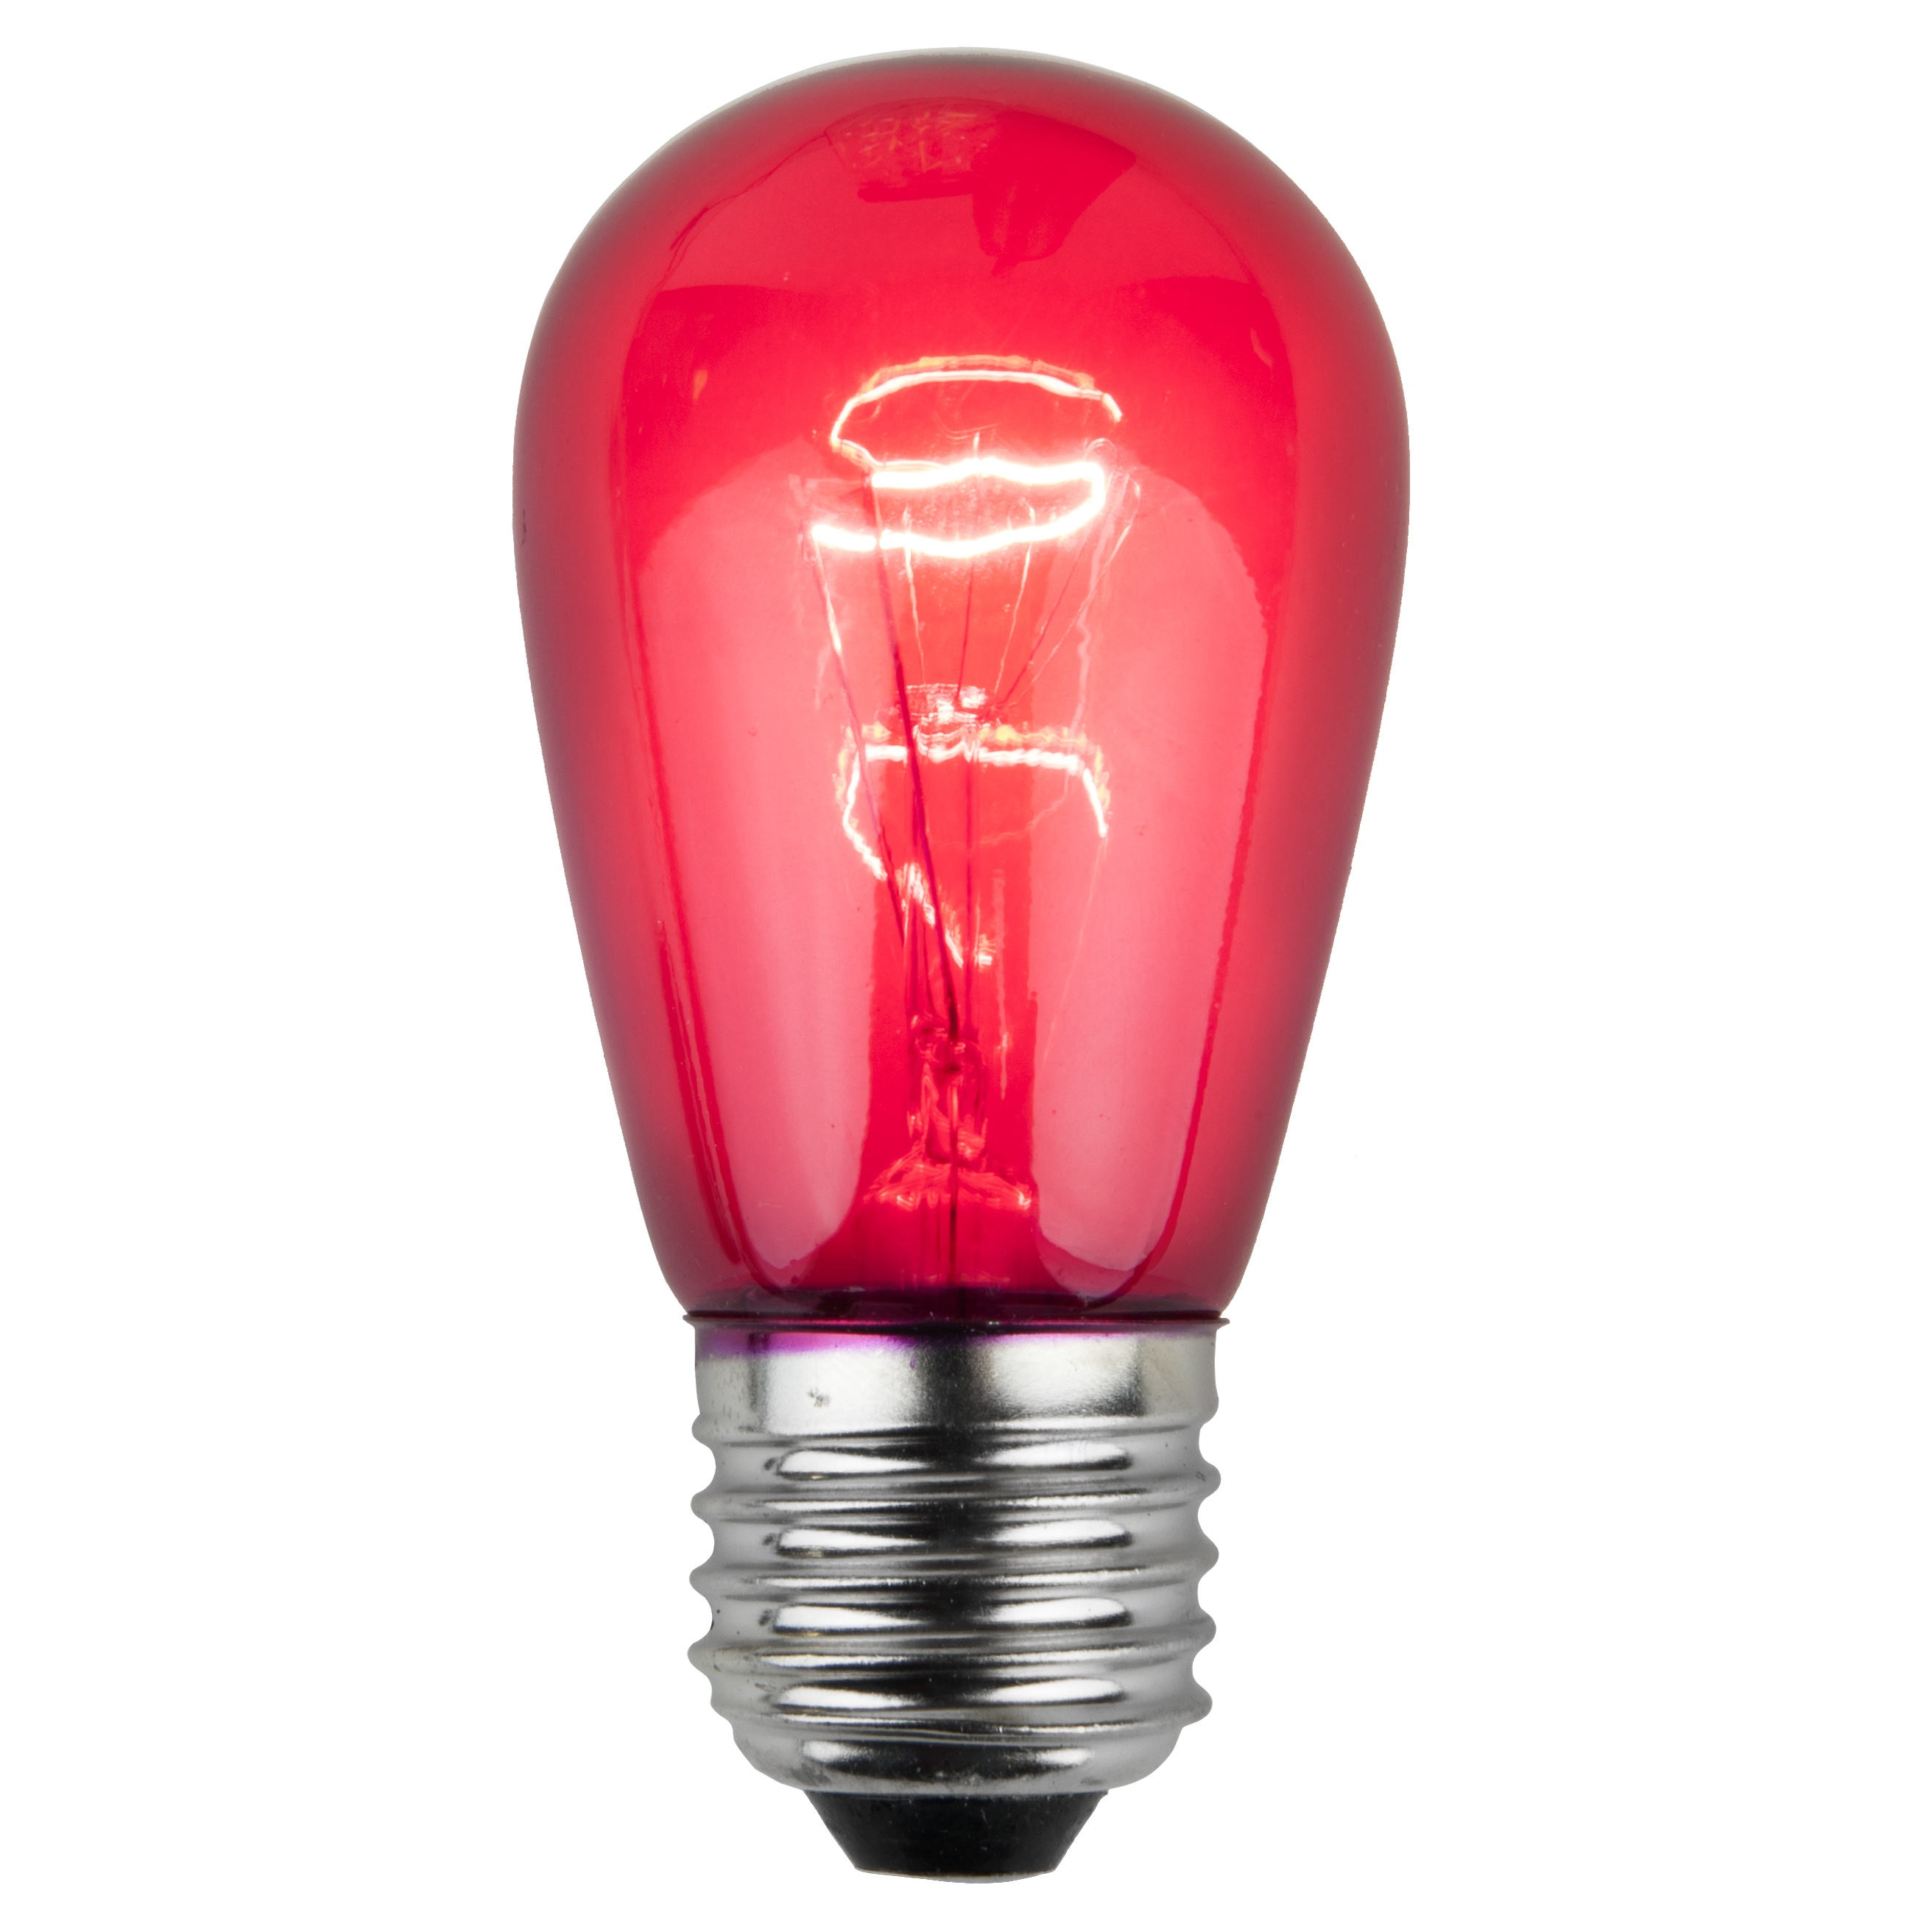 S14 Transparent Pink, 11 Watt